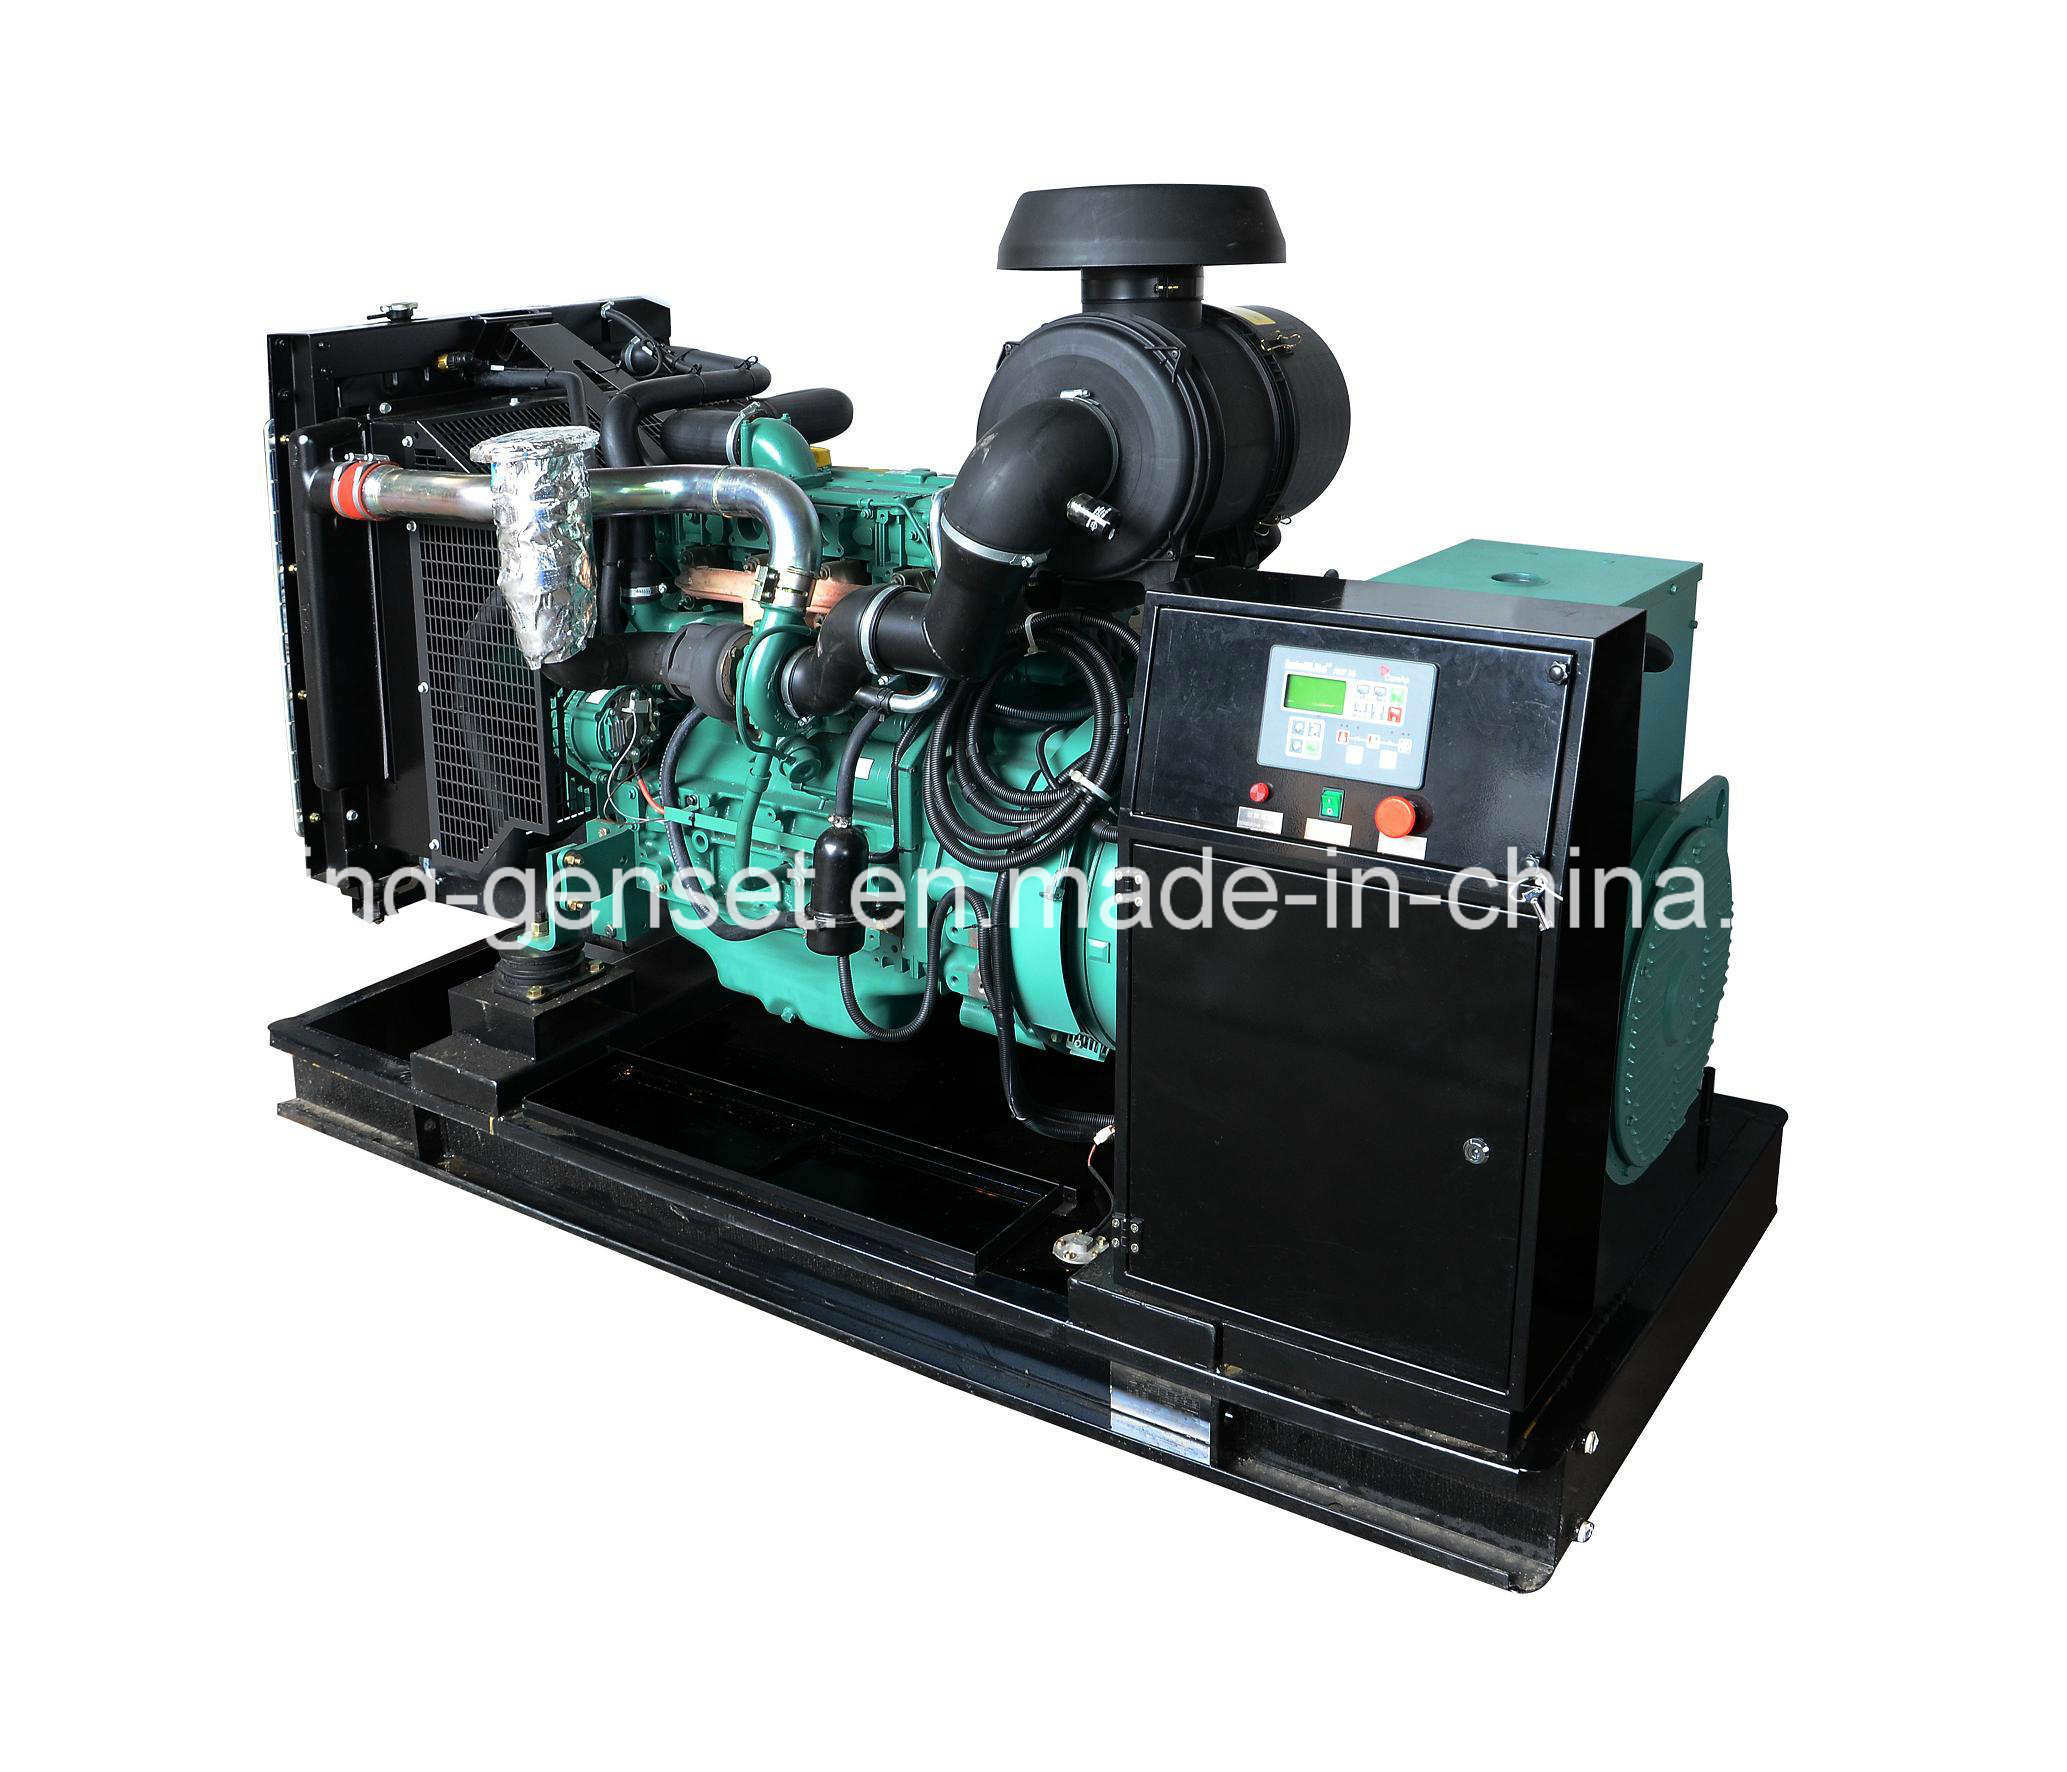 75kVA-687.5kVA Diesel Open Generator/Diesel Frame Generator/Genset/Generation/Generating with Vovol Engine (VK33700)